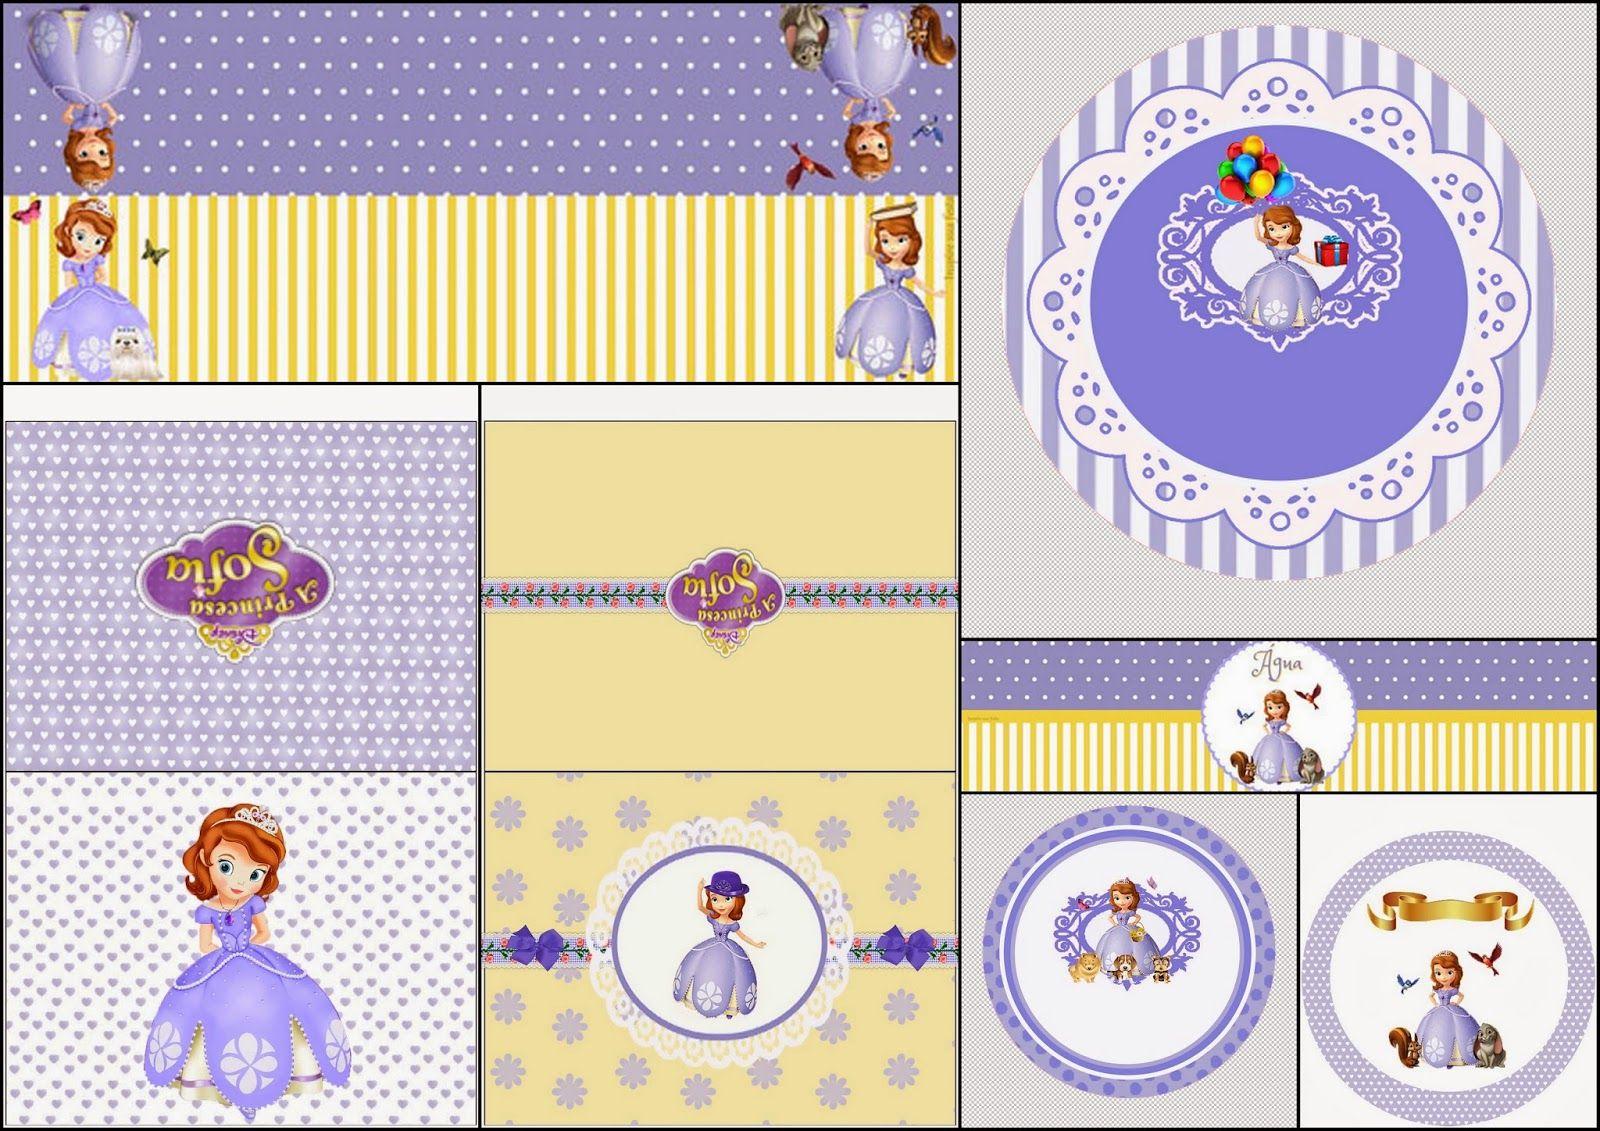 Película de los Minions: Etiquetas para Candy Bar para Imprimir ...